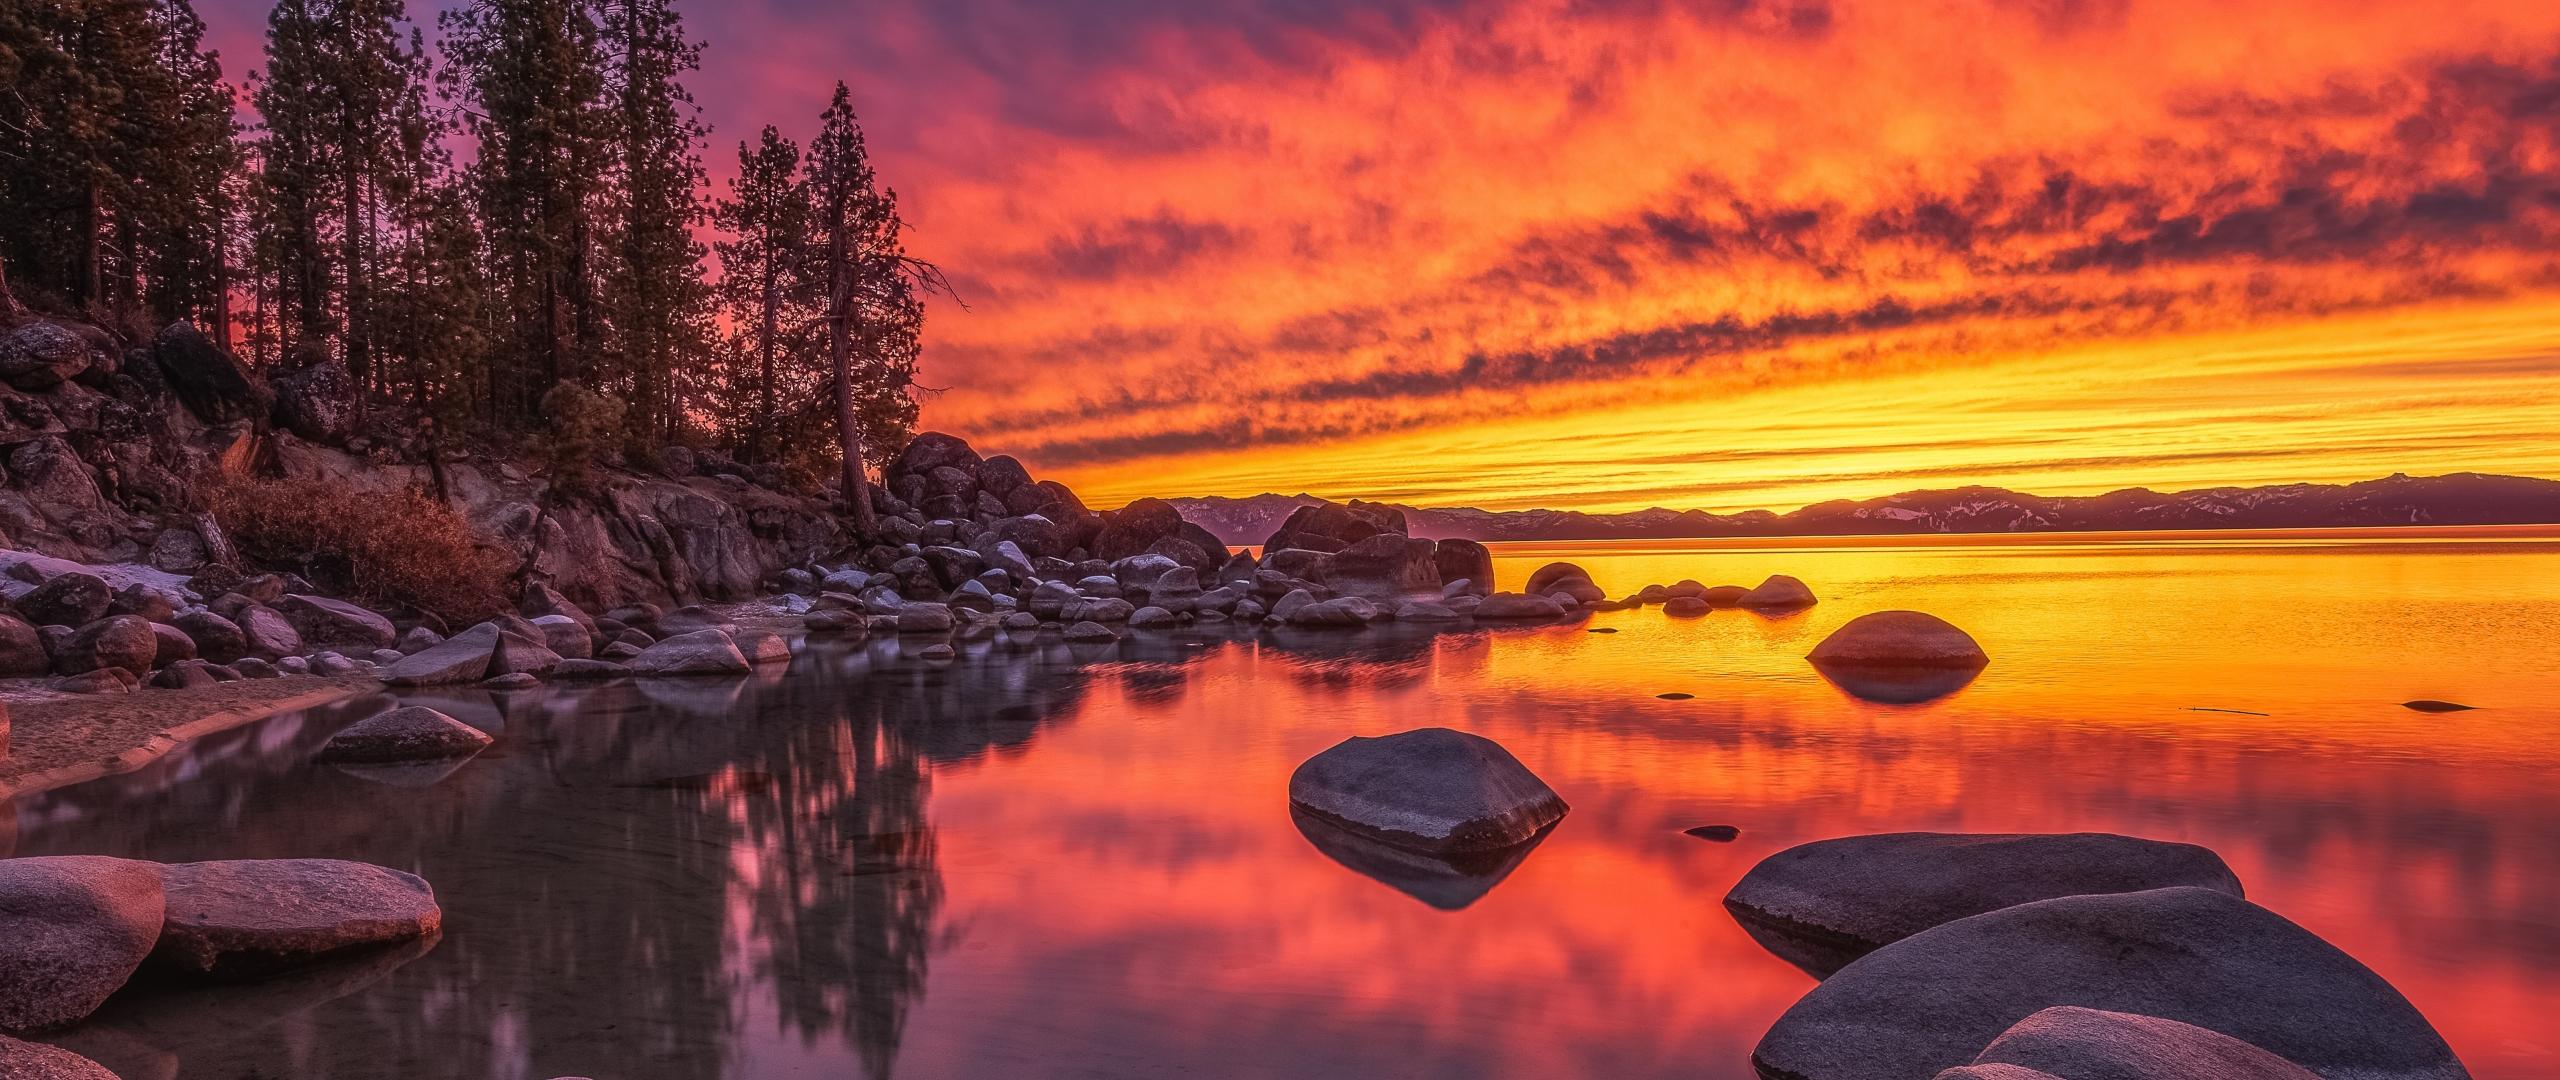 Lake Tahoe Nevada Wallpaper in 2560x1080 Resolution